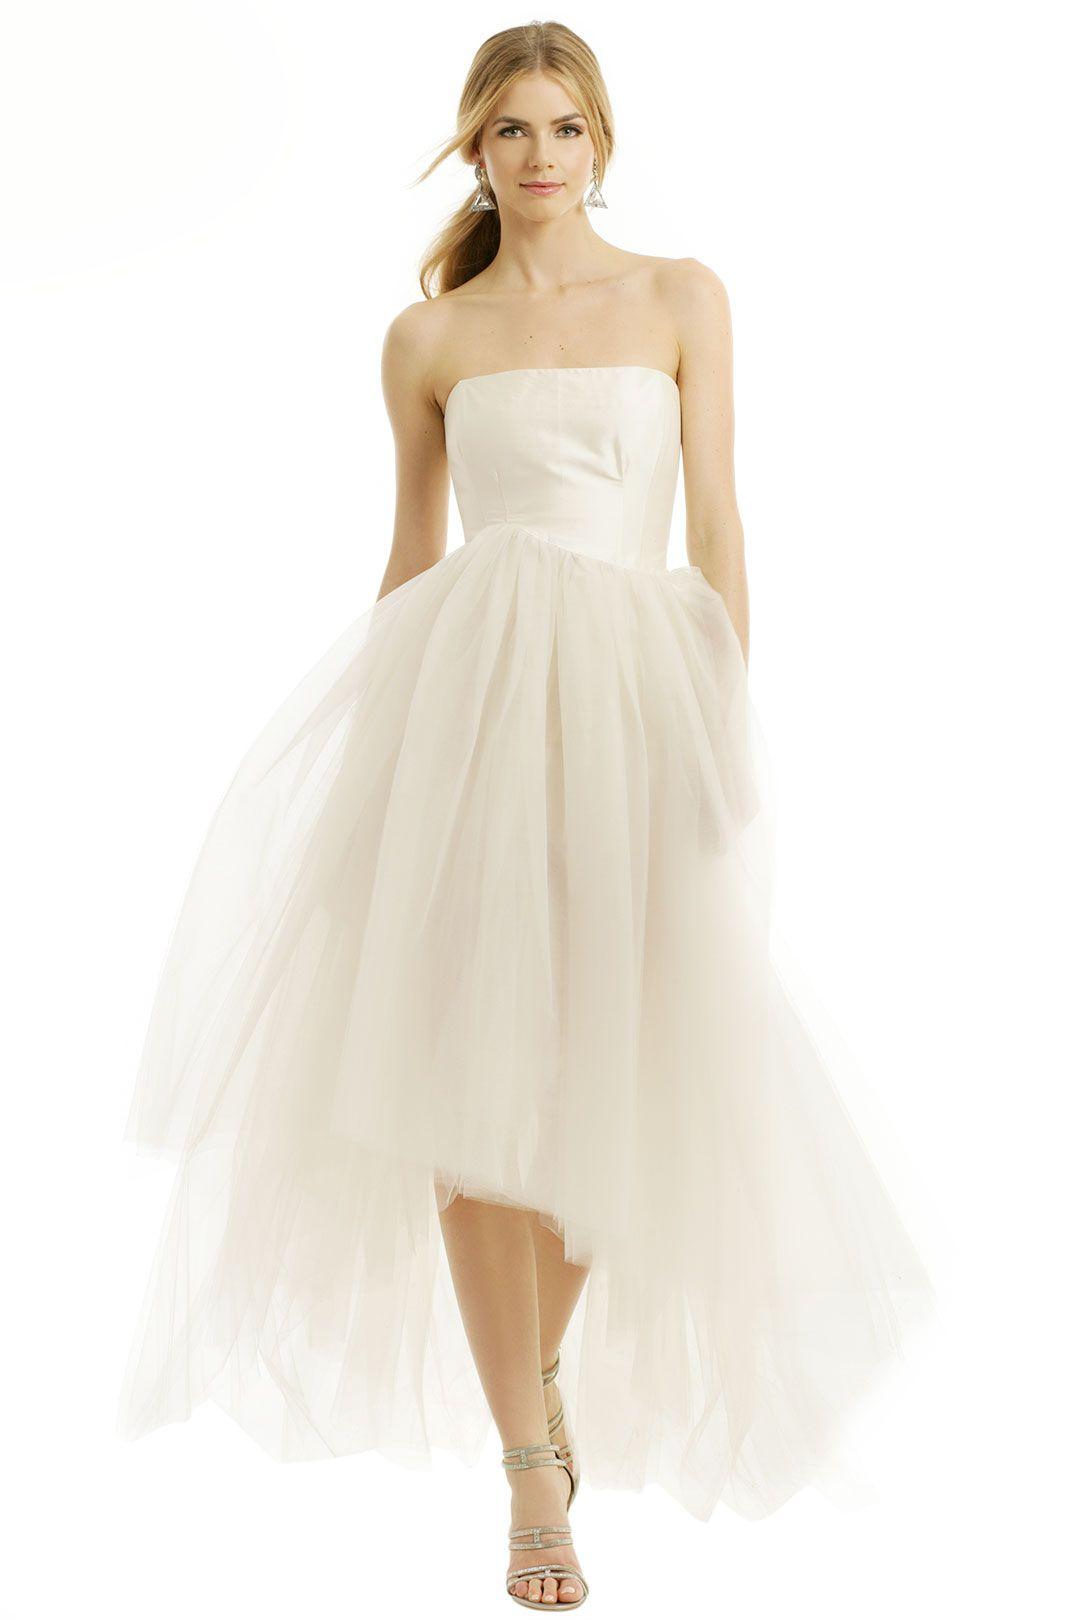 Wedding dresses rental  Sugar Coat Dress by allison parris at   Rent The Runway  One